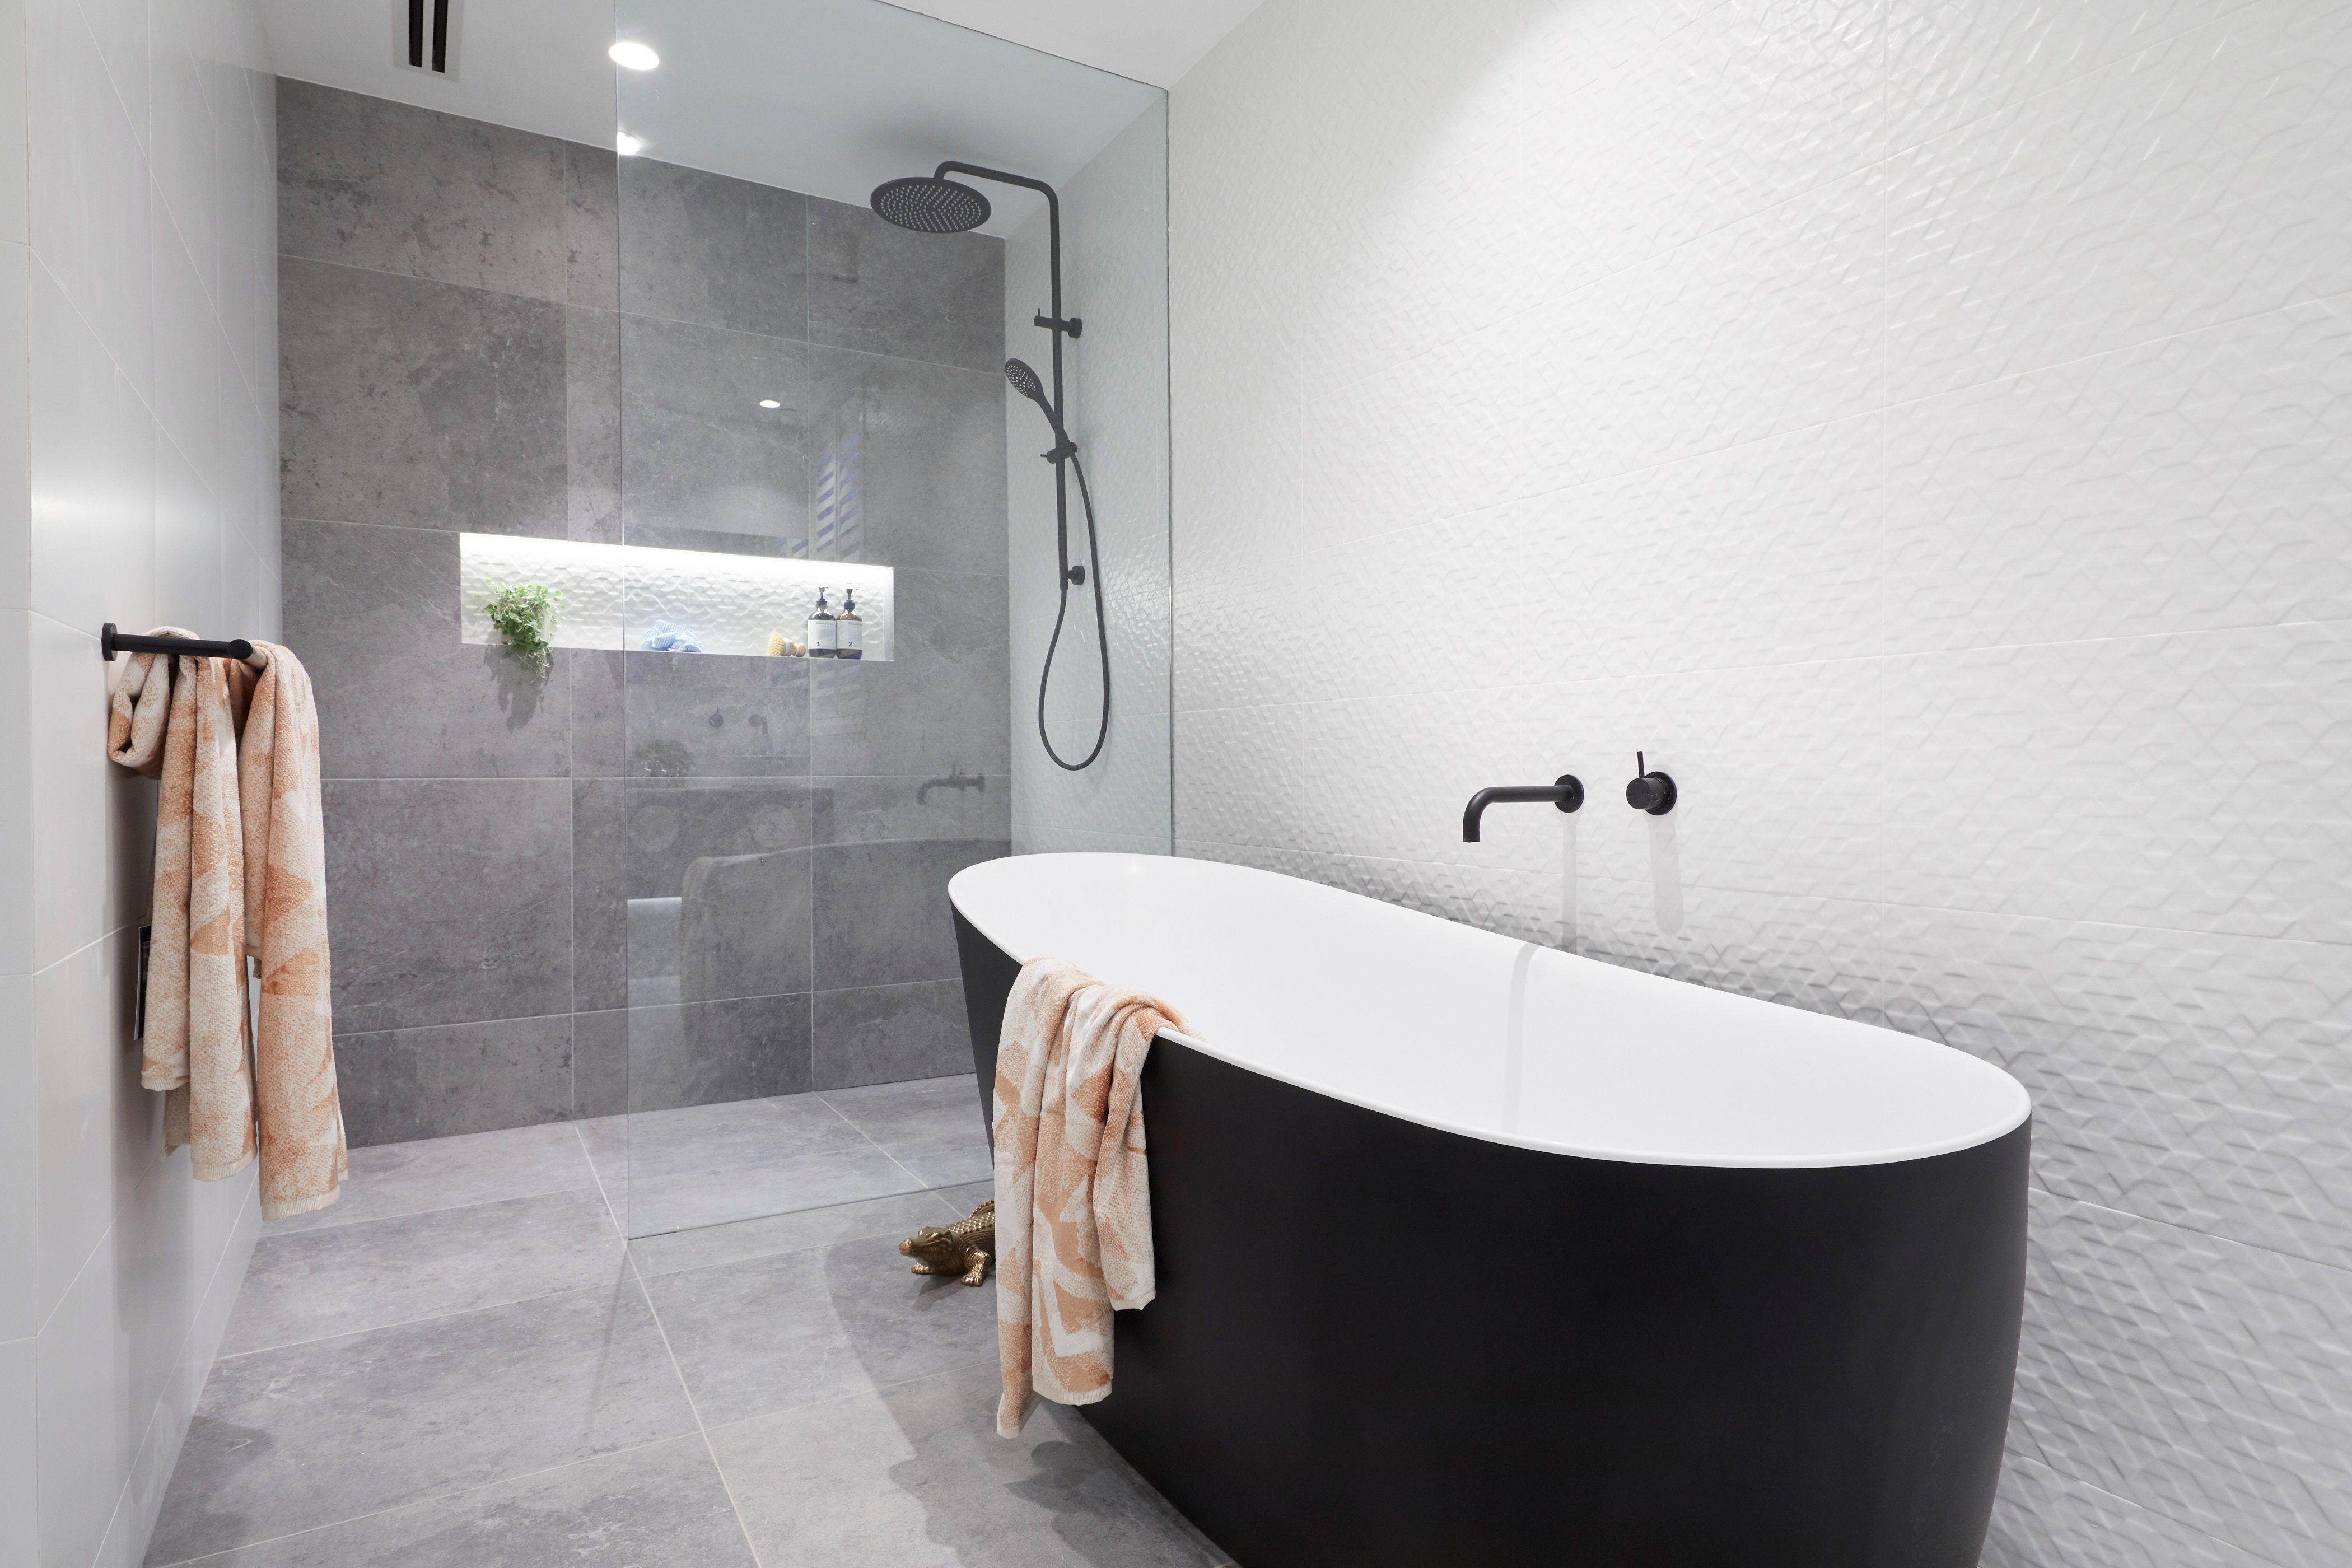 Hayden Sara S Challenge Bathroom From The Block 2018 At The Gatwick In St Kilda Australia Reece Bathroom The Block Bathroom Black Bathroom